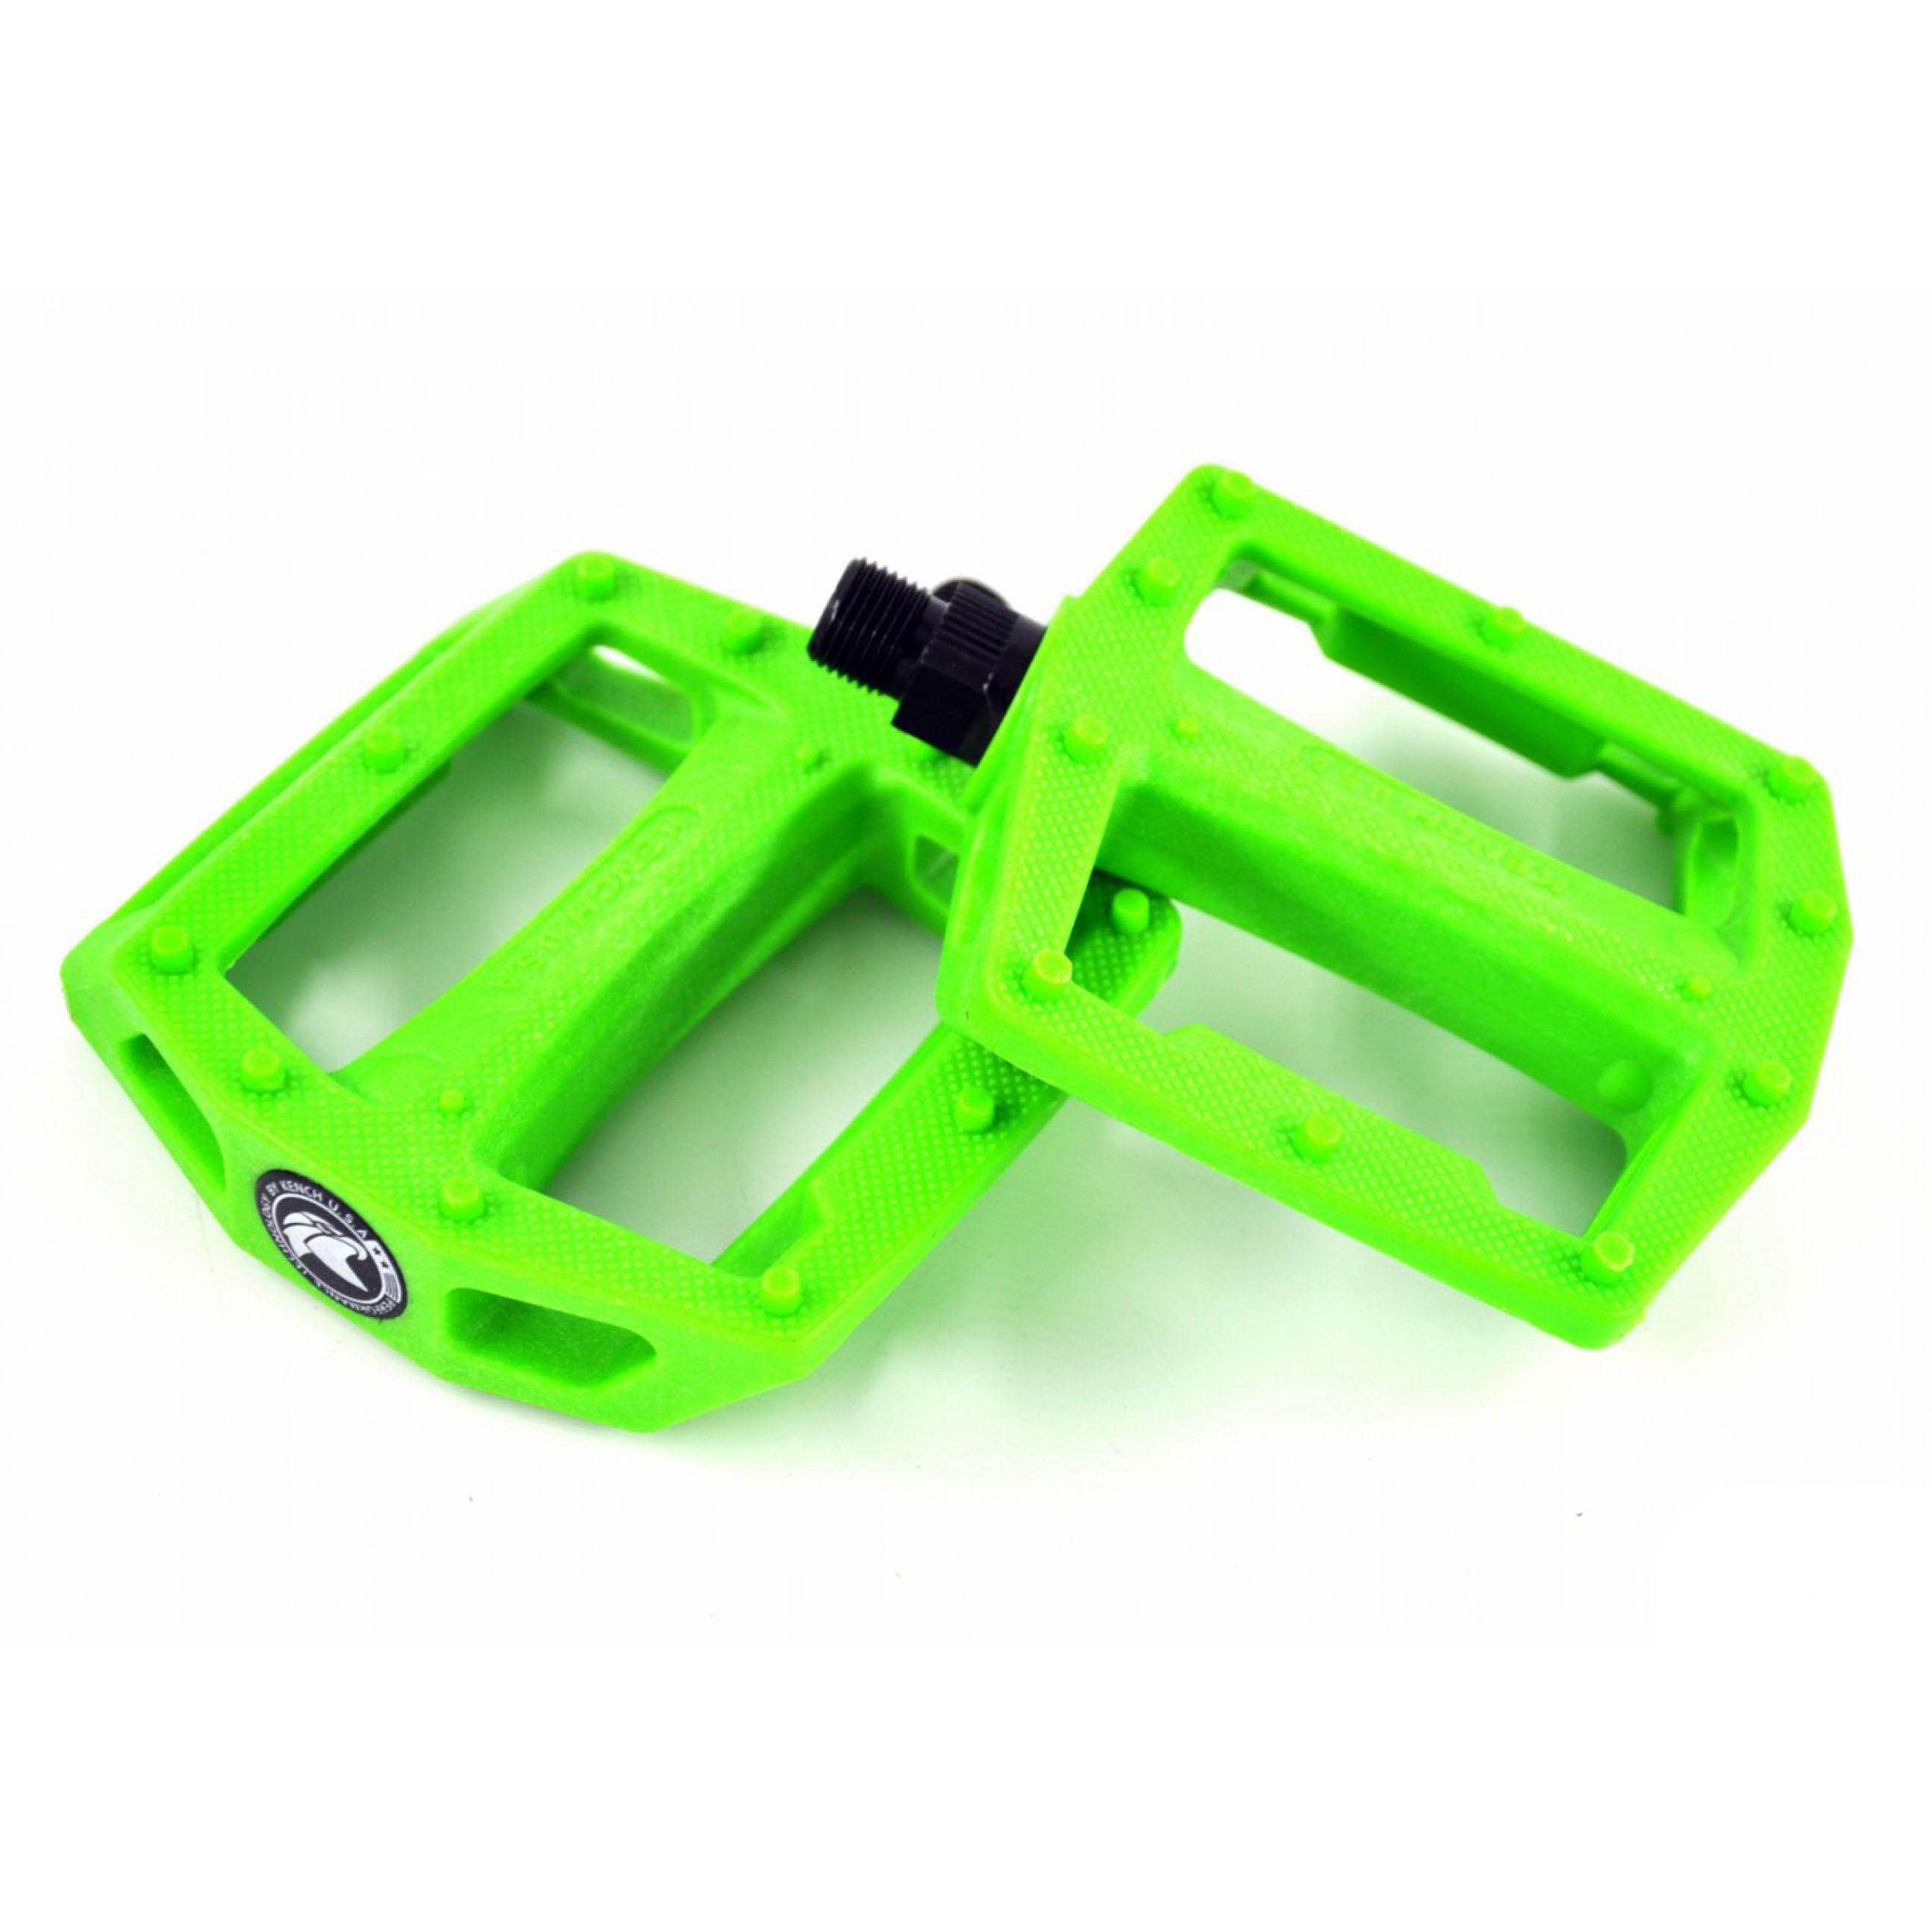 Фото Педаль нейлон-пластик с шипом зеленая